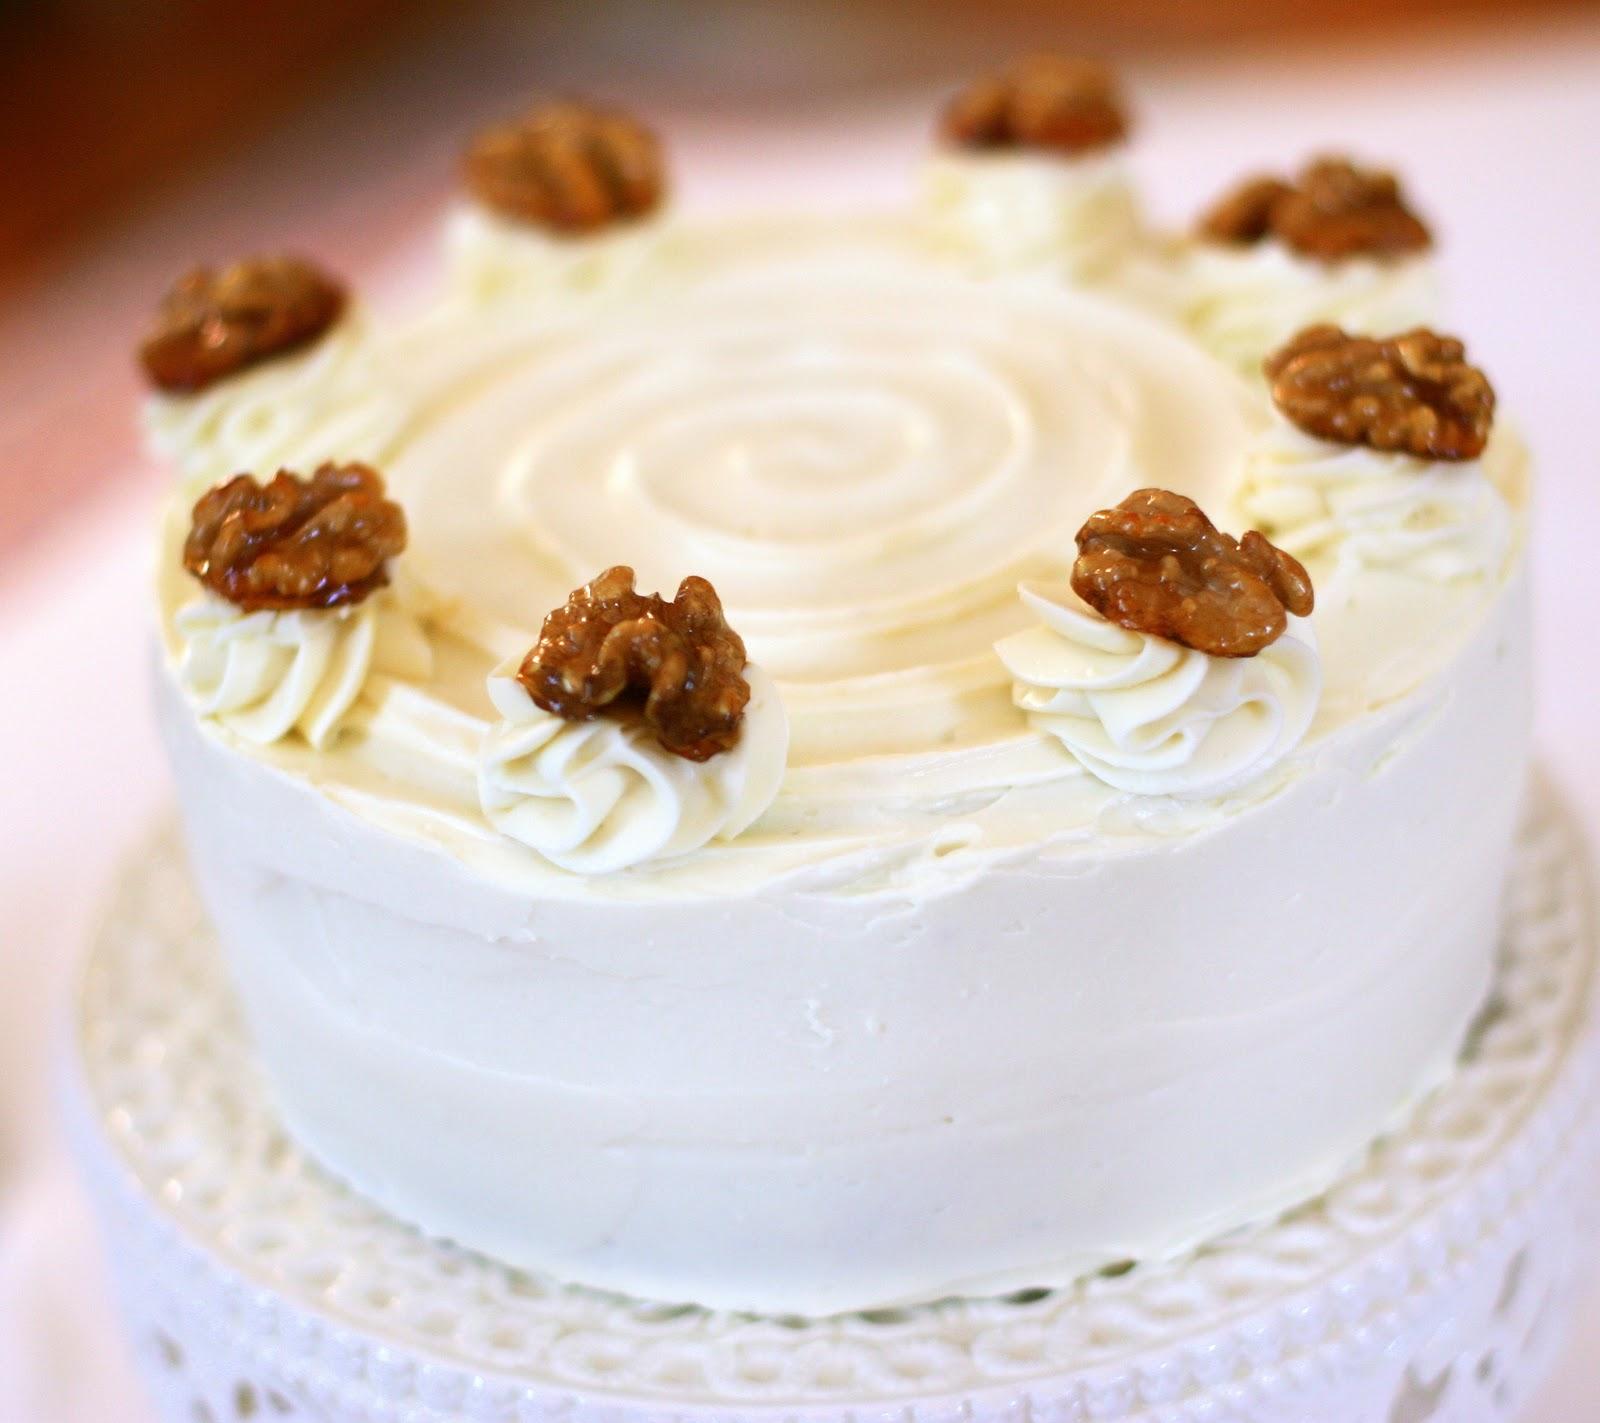 Tish Boyle Sweet Dreams: Walnut Layer Cake With Apple